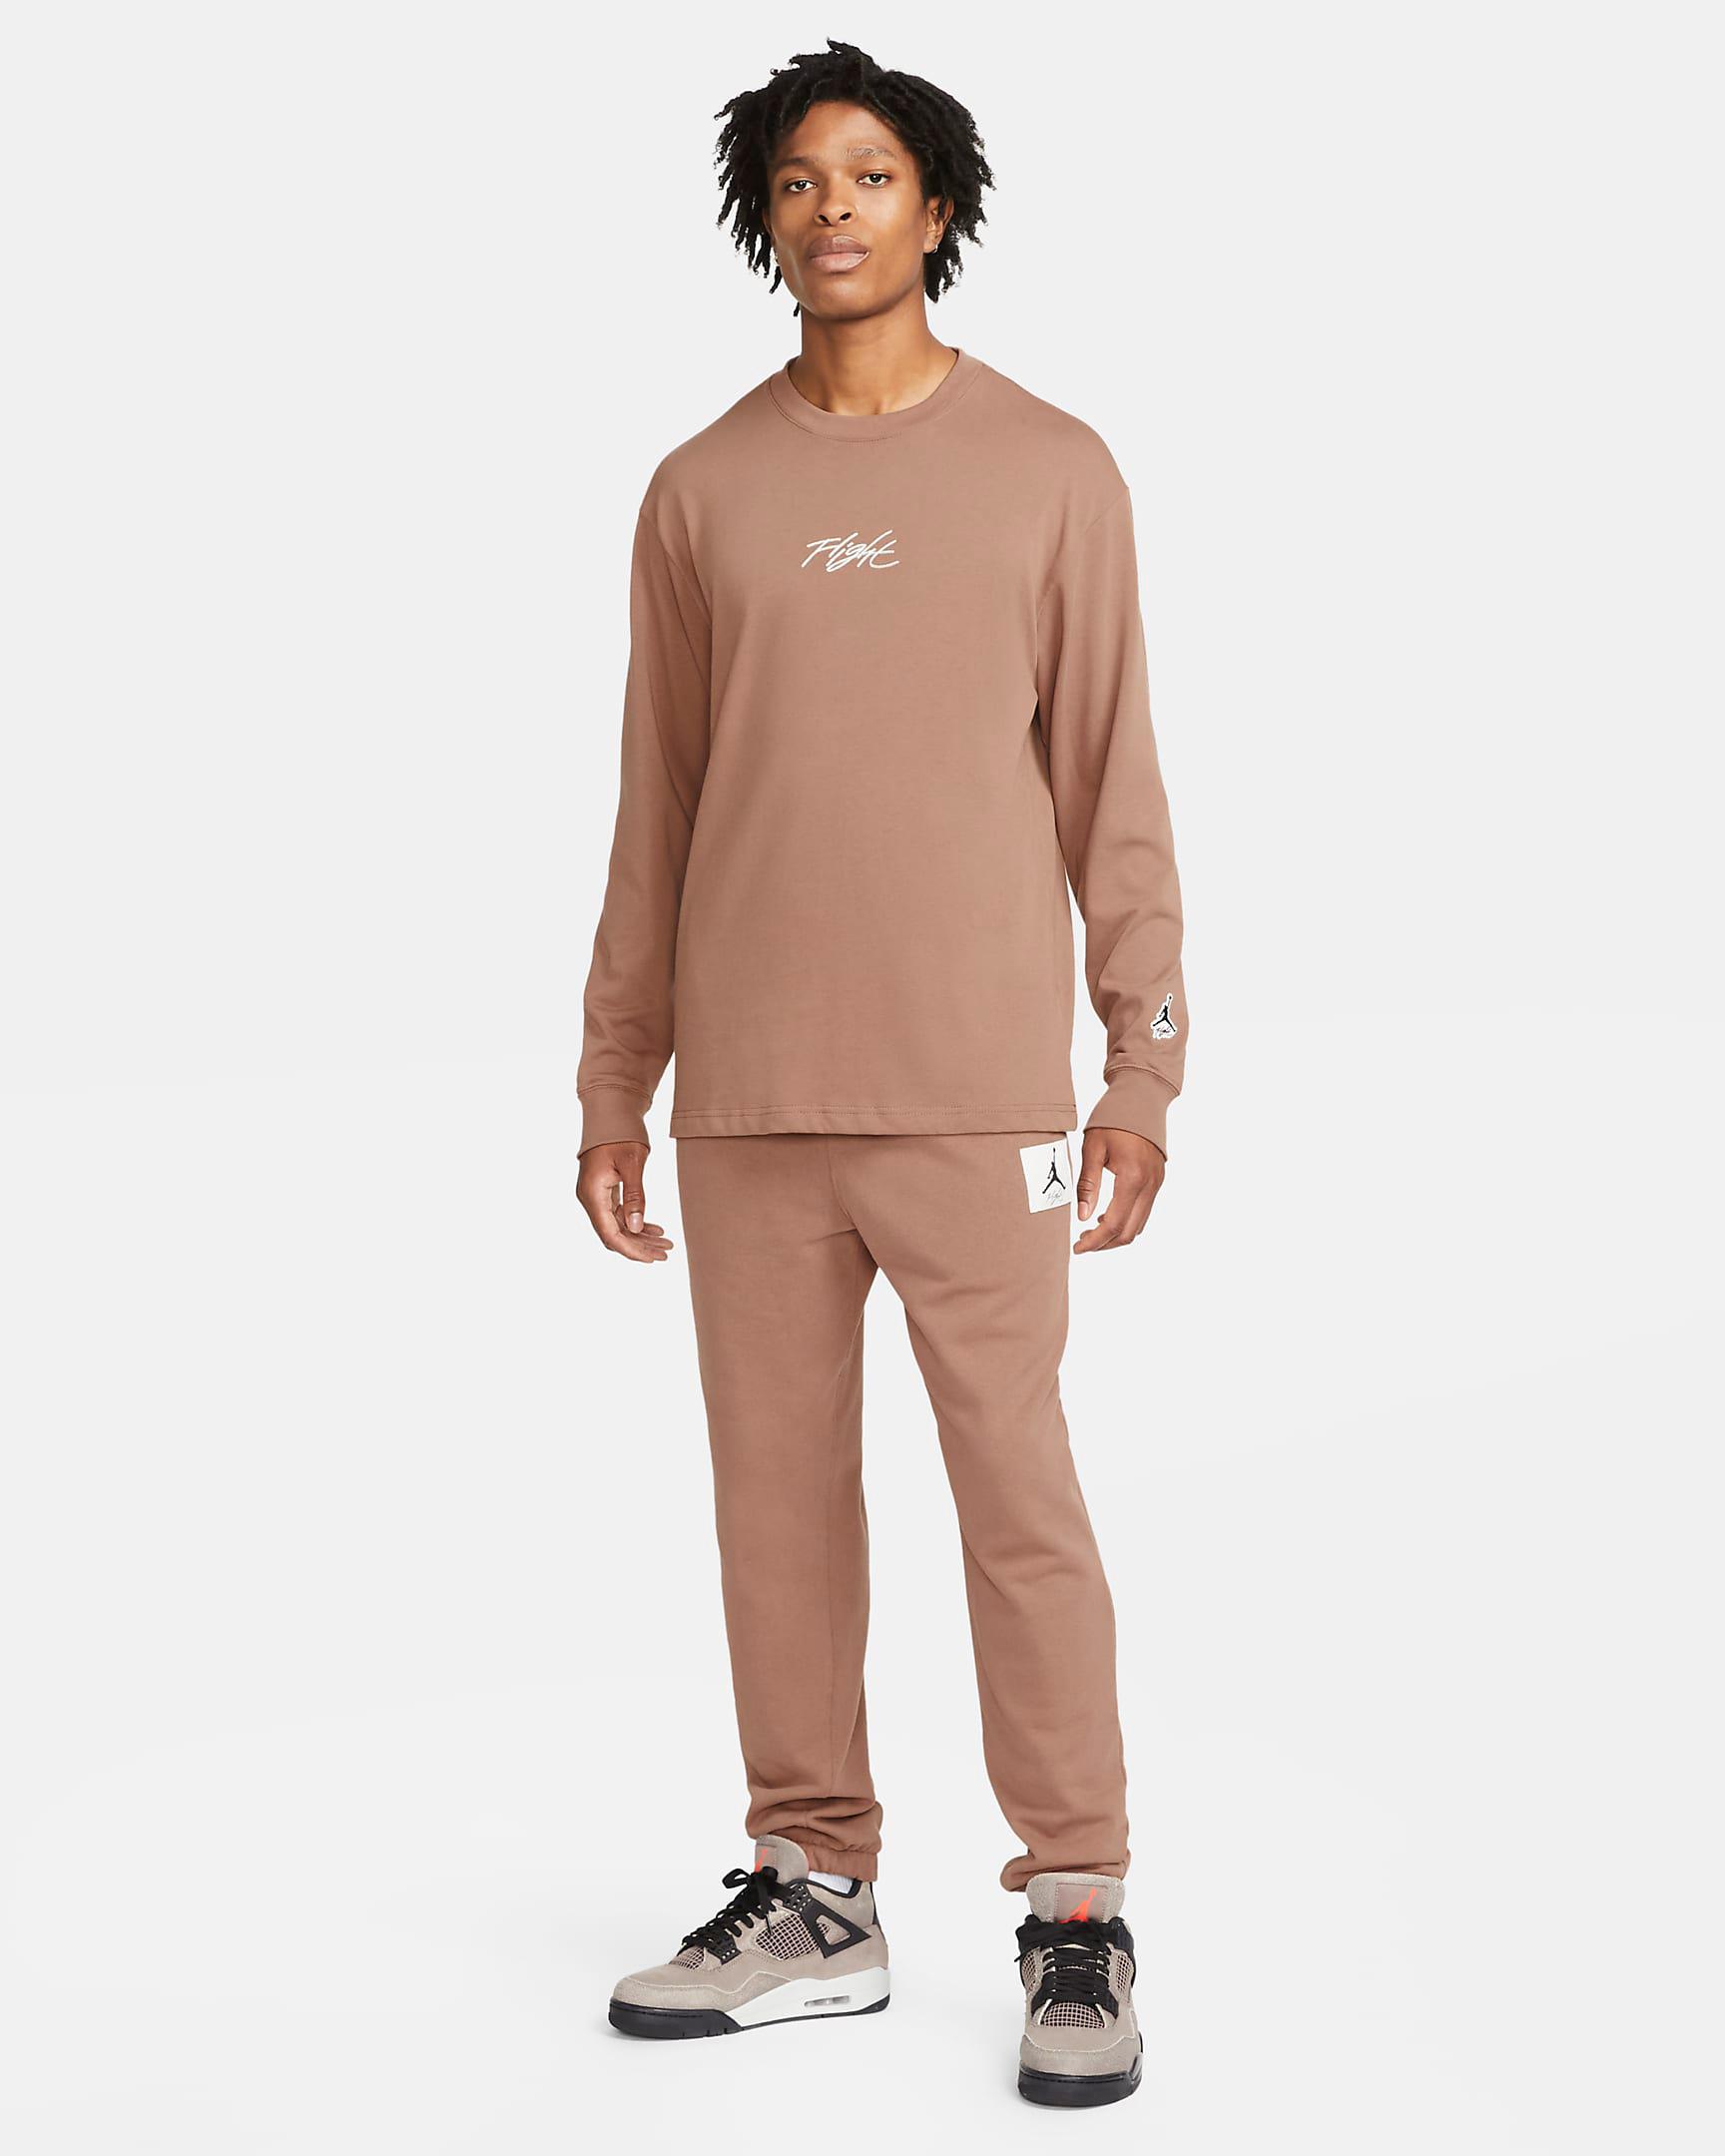 jordan-archaeo-brown-shirt-pants-outfit